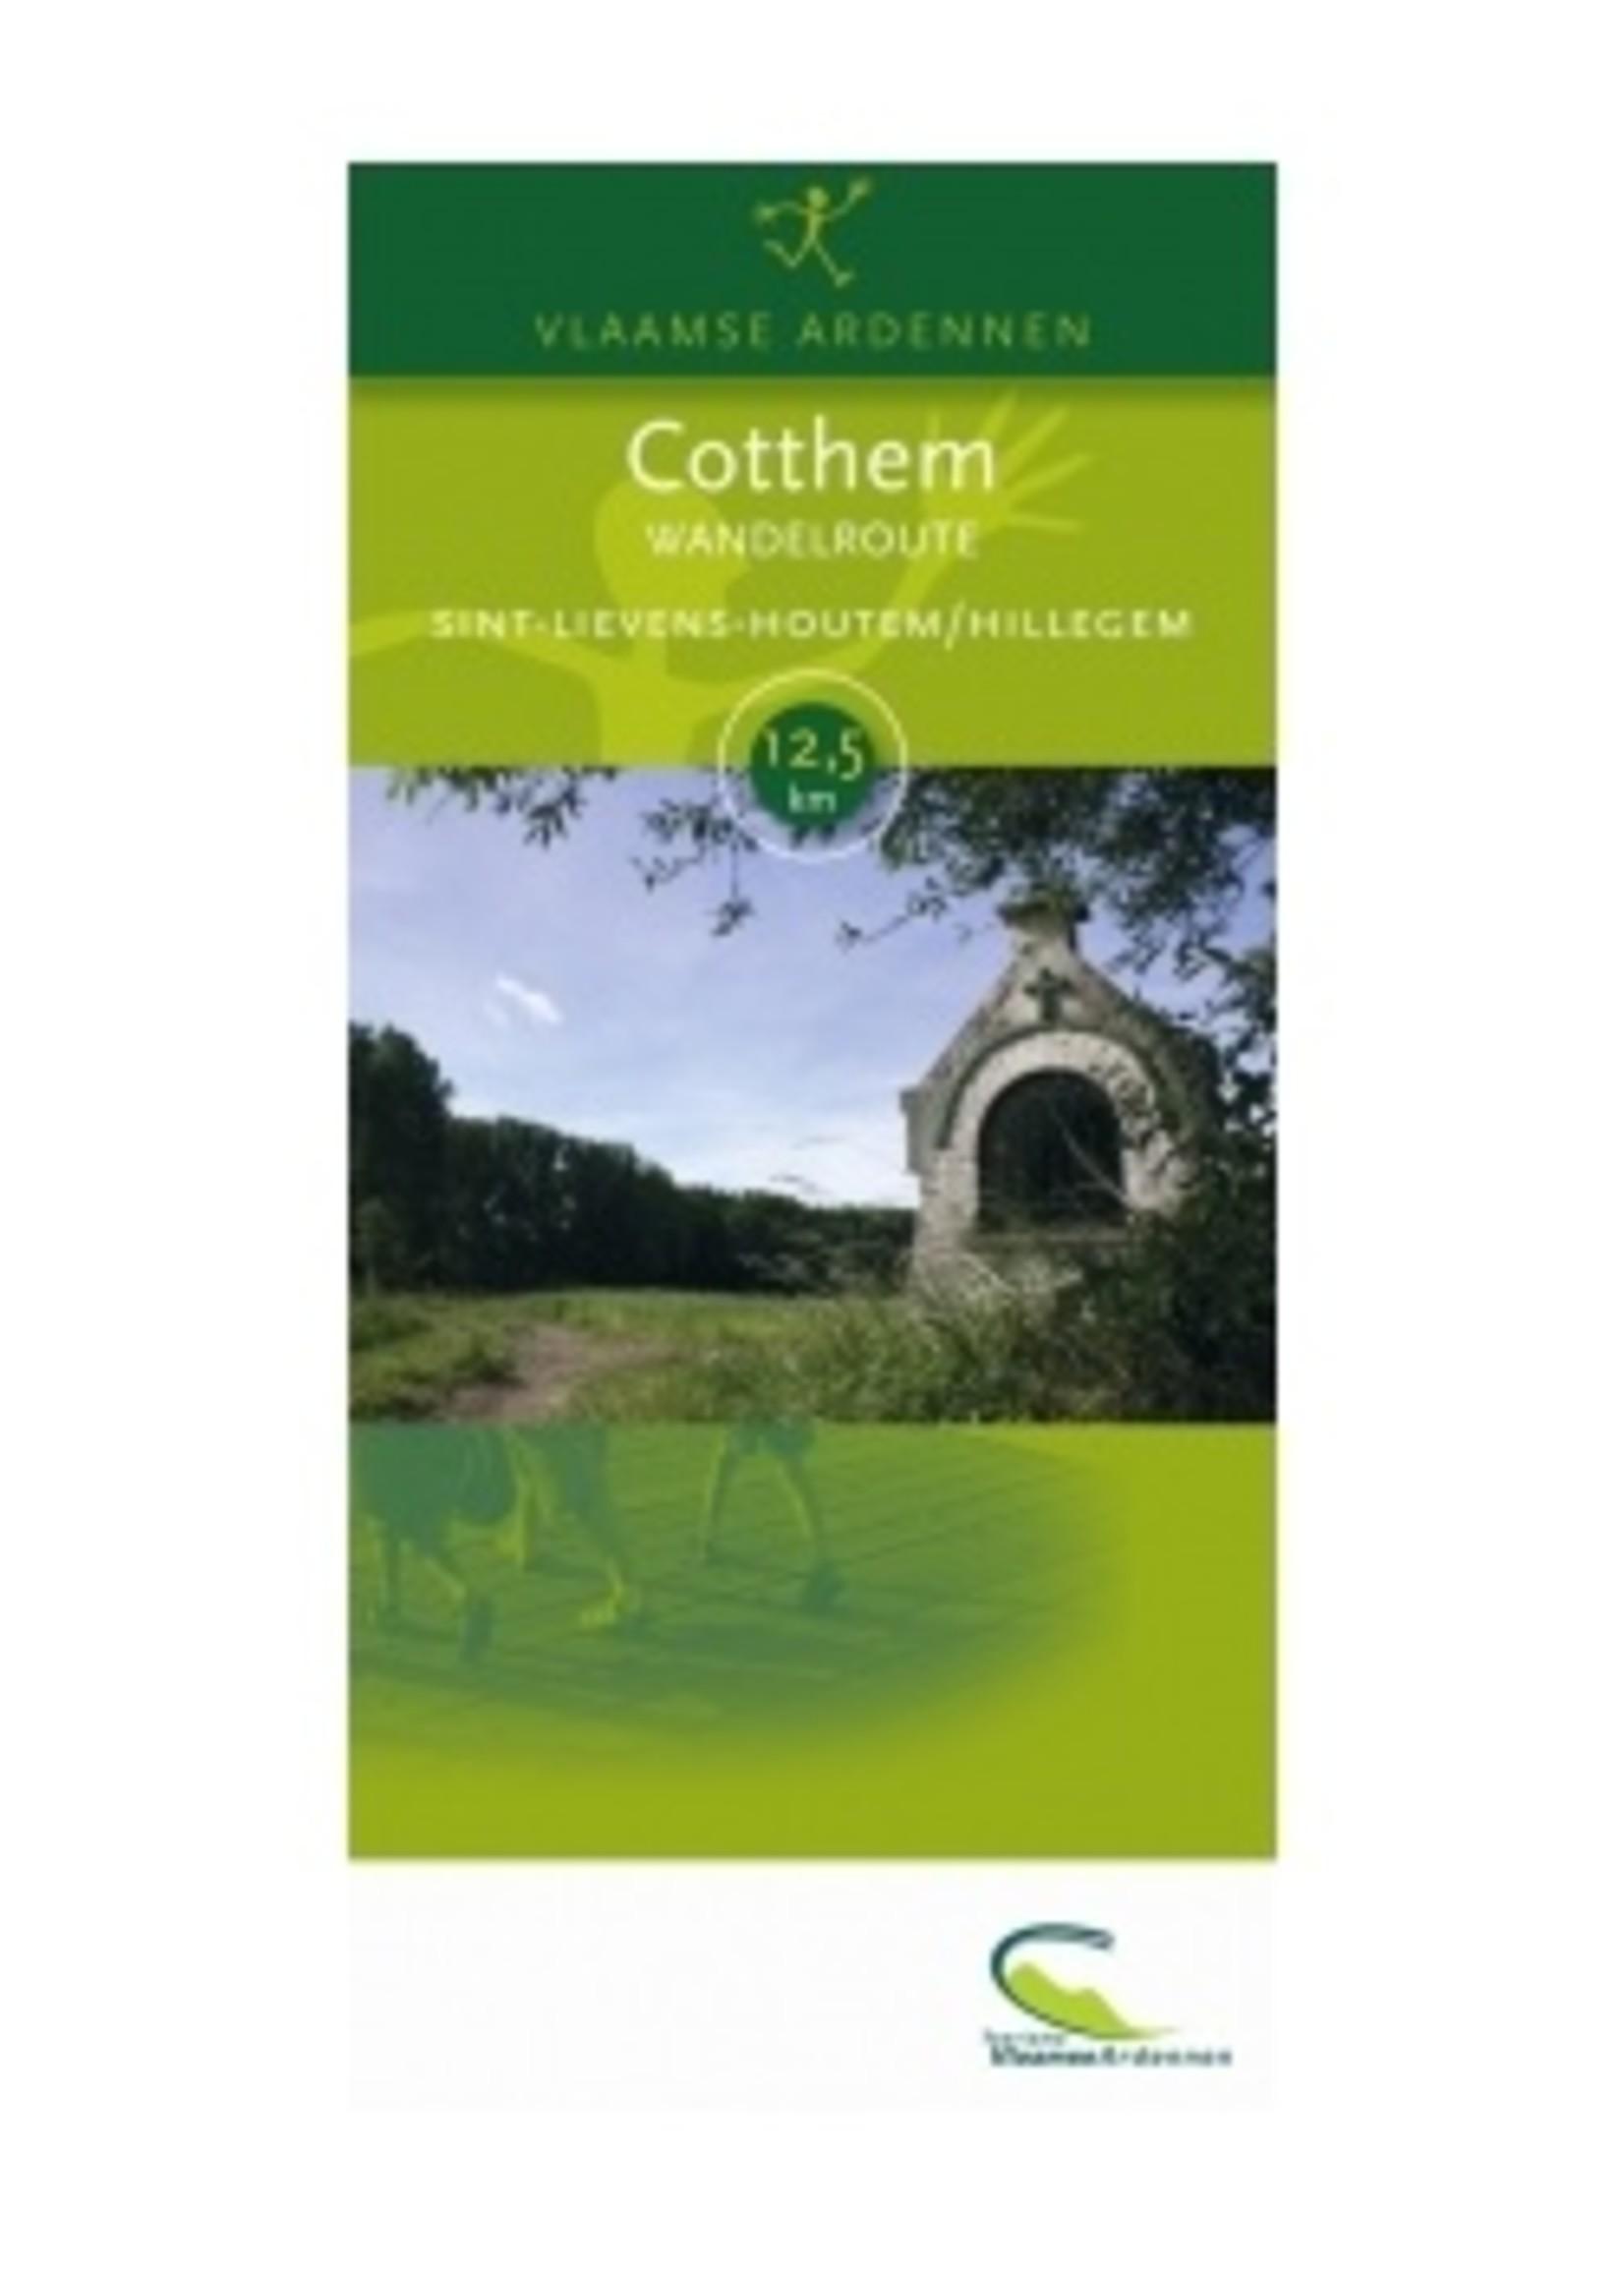 Map (walk) 'Cotthem' (Sint Lievens Houtem) -> 12,5km